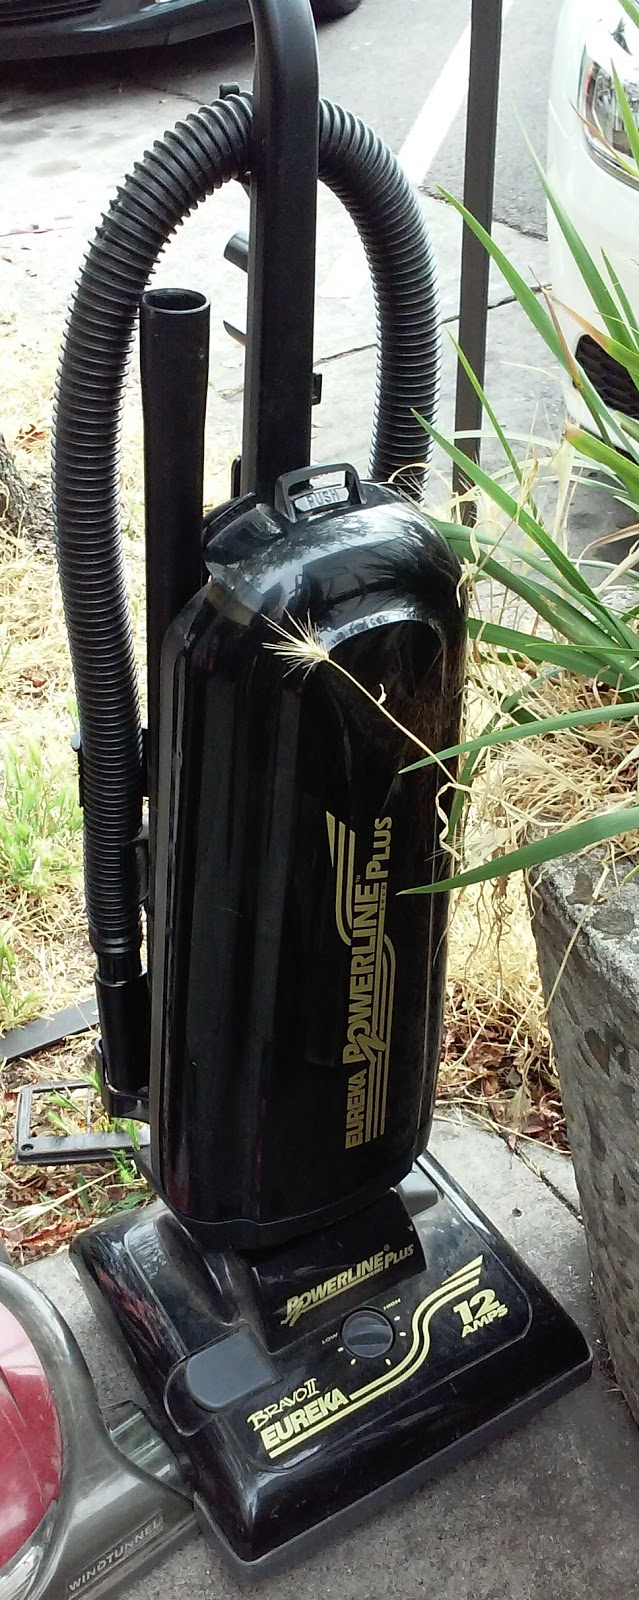 UHURU FURNITURE COLLECTIBLES SOLD 1727 Eureka Bravo II Vacuum